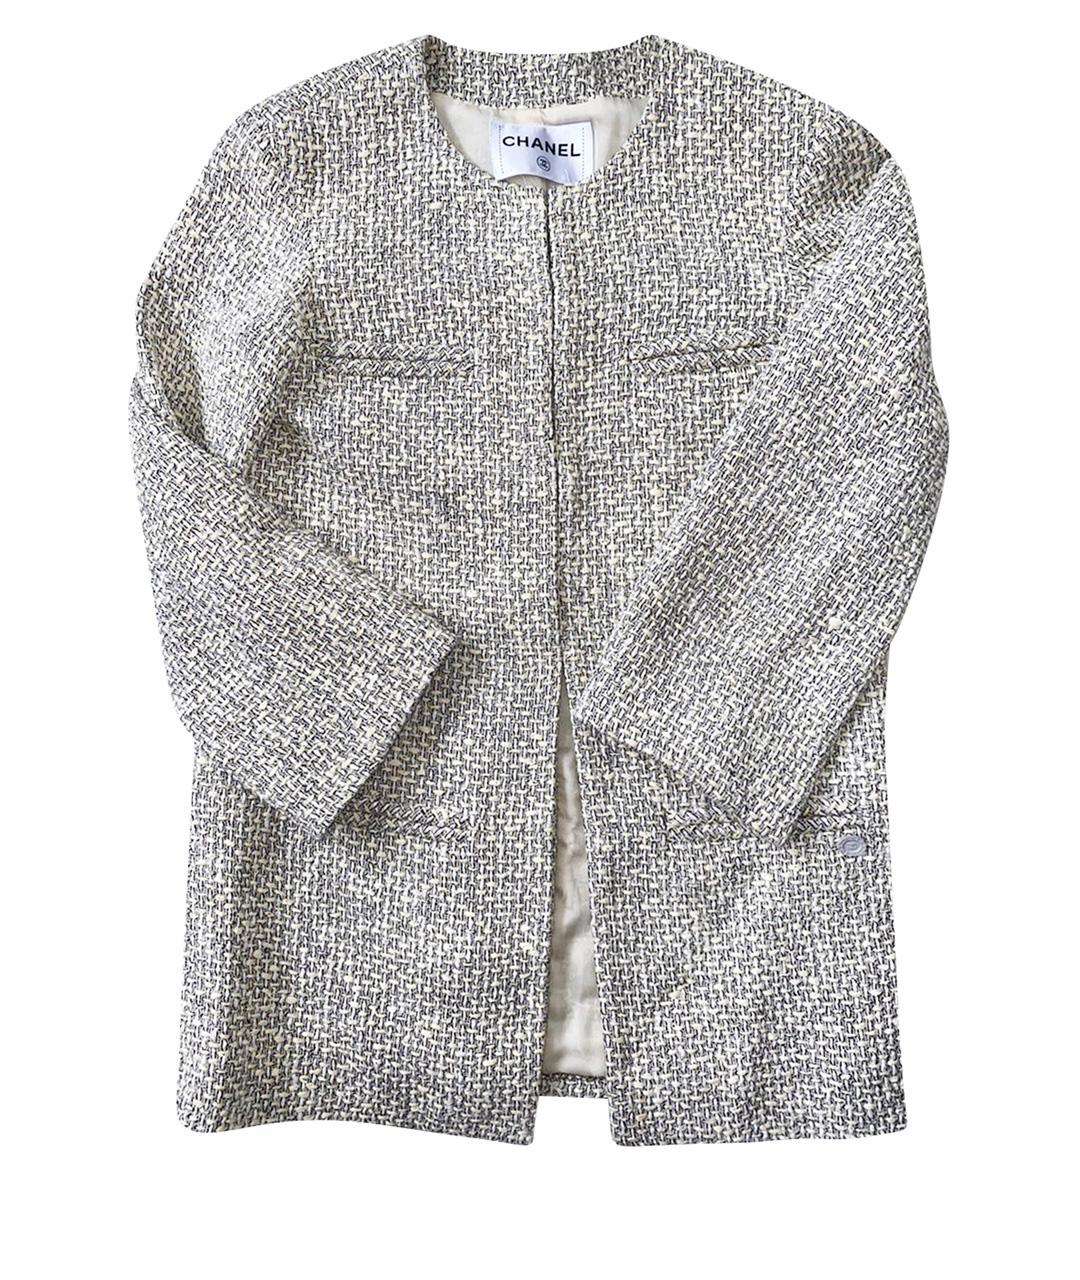 Chanel Runway Pastel Tweed Jacket